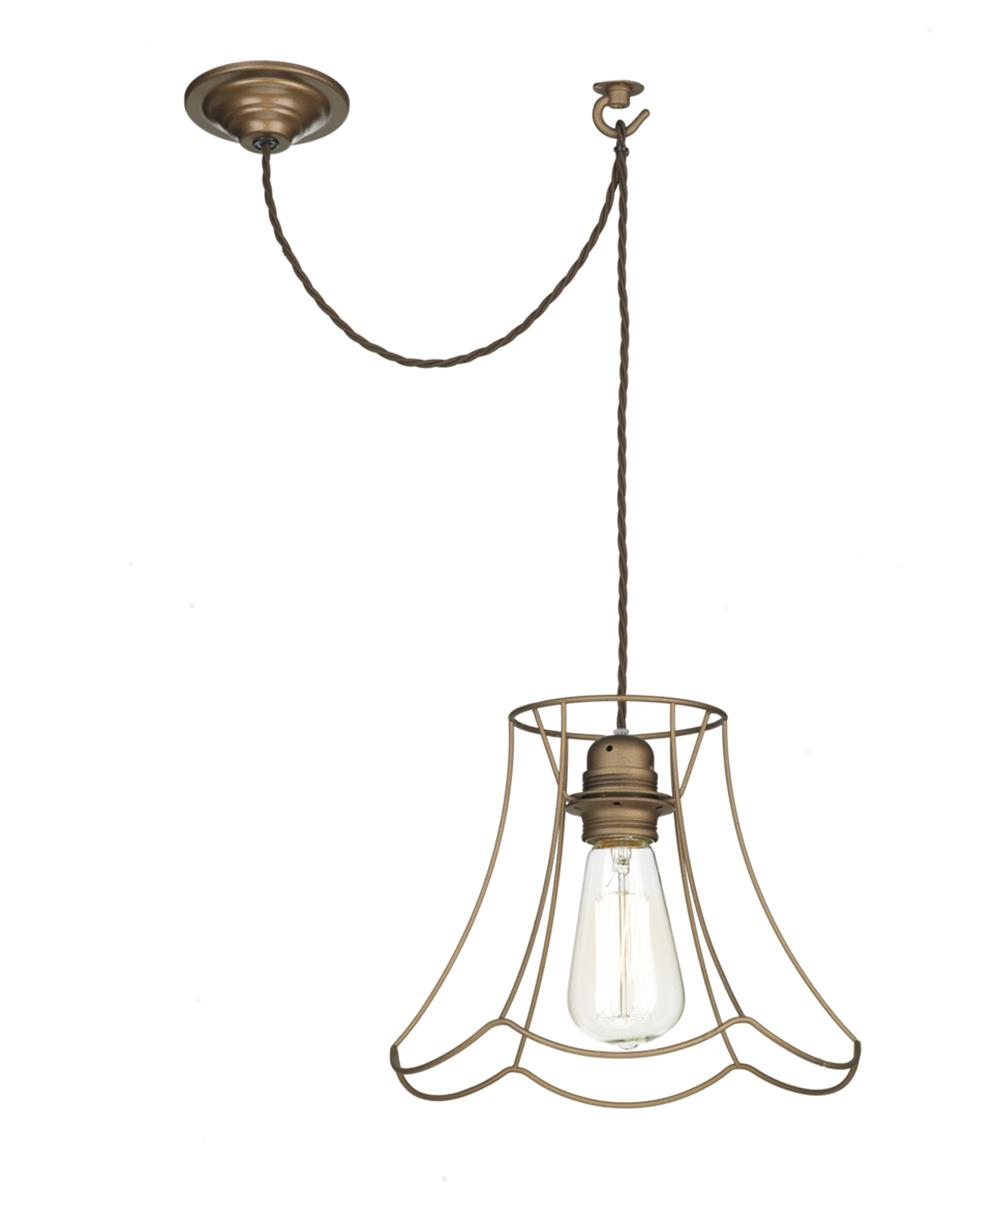 David Hunt Lighting ORE8663 Oregon 1 Light large Pendant in bronze